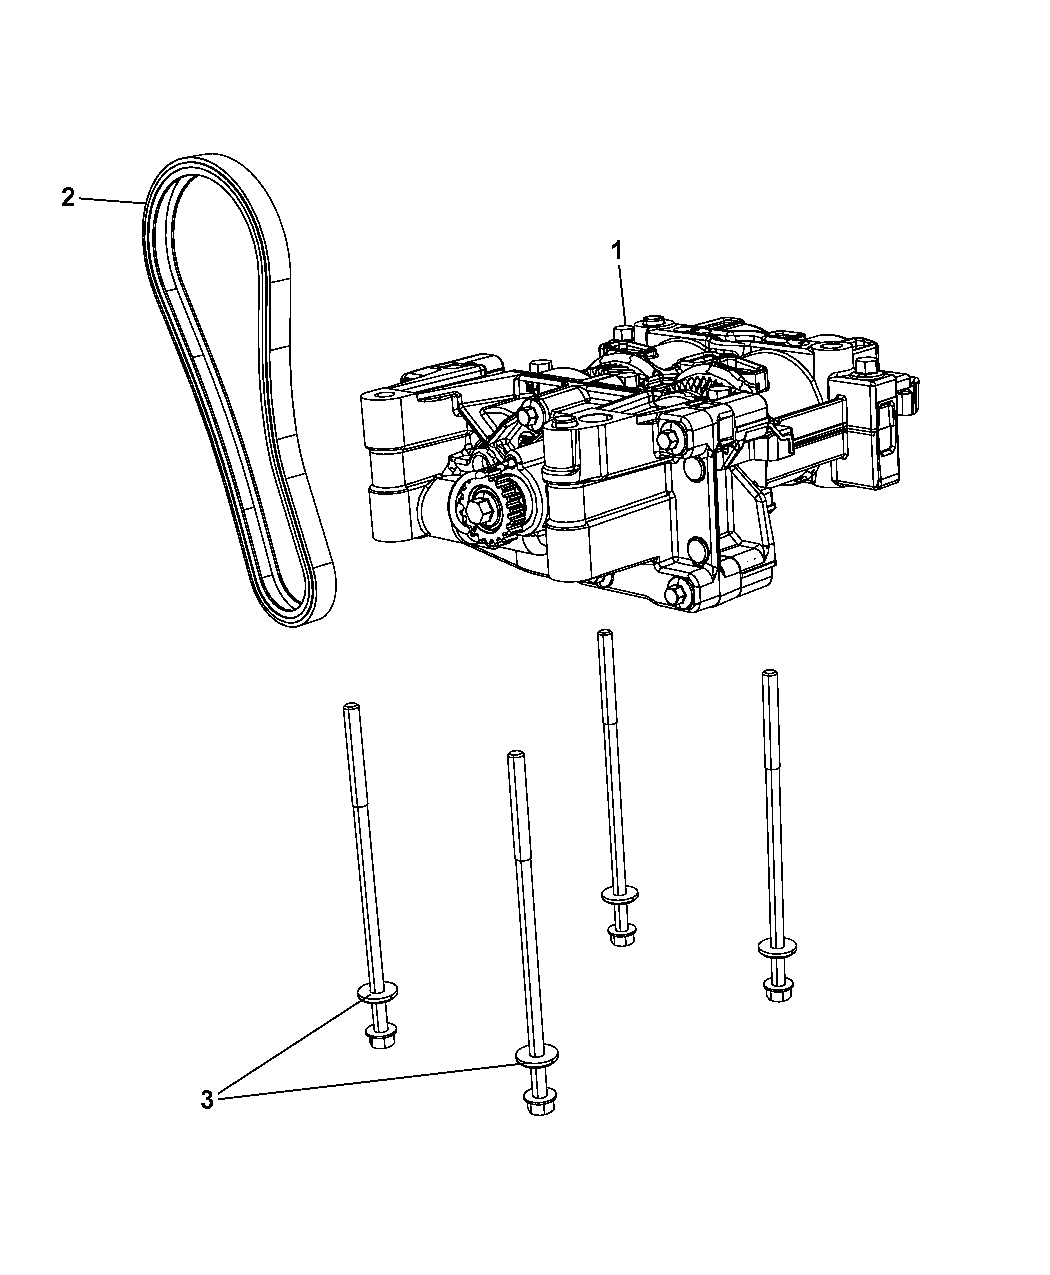 2013 Jeep Compass Balance Shaft Oil Pump Assembly Engine Diagram Thumbnail 2